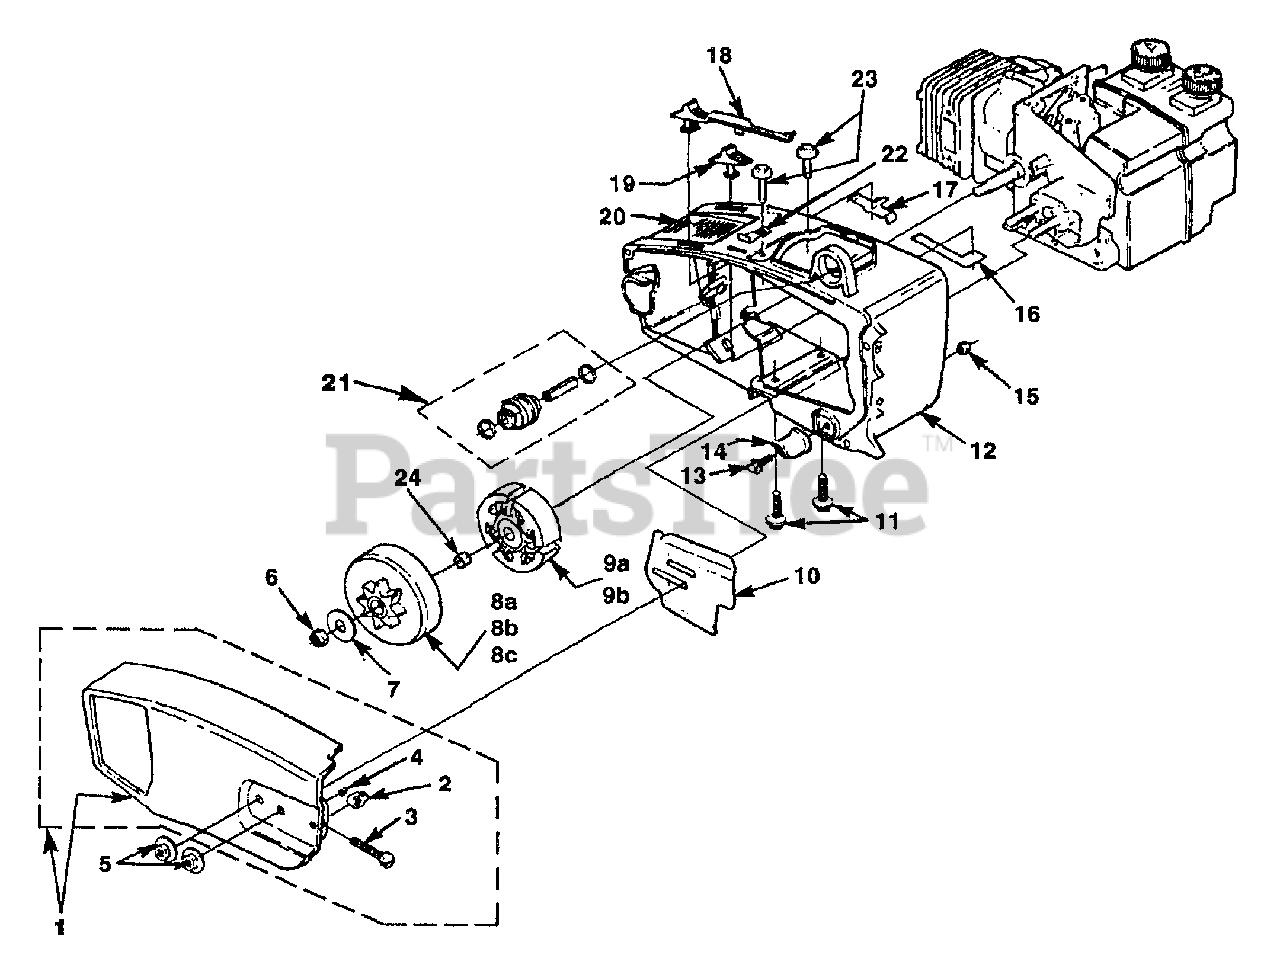 homelite 240 (ut 10630 c) homelite chainsaw engine housing concept diagrams architecture engine housing diagram #10